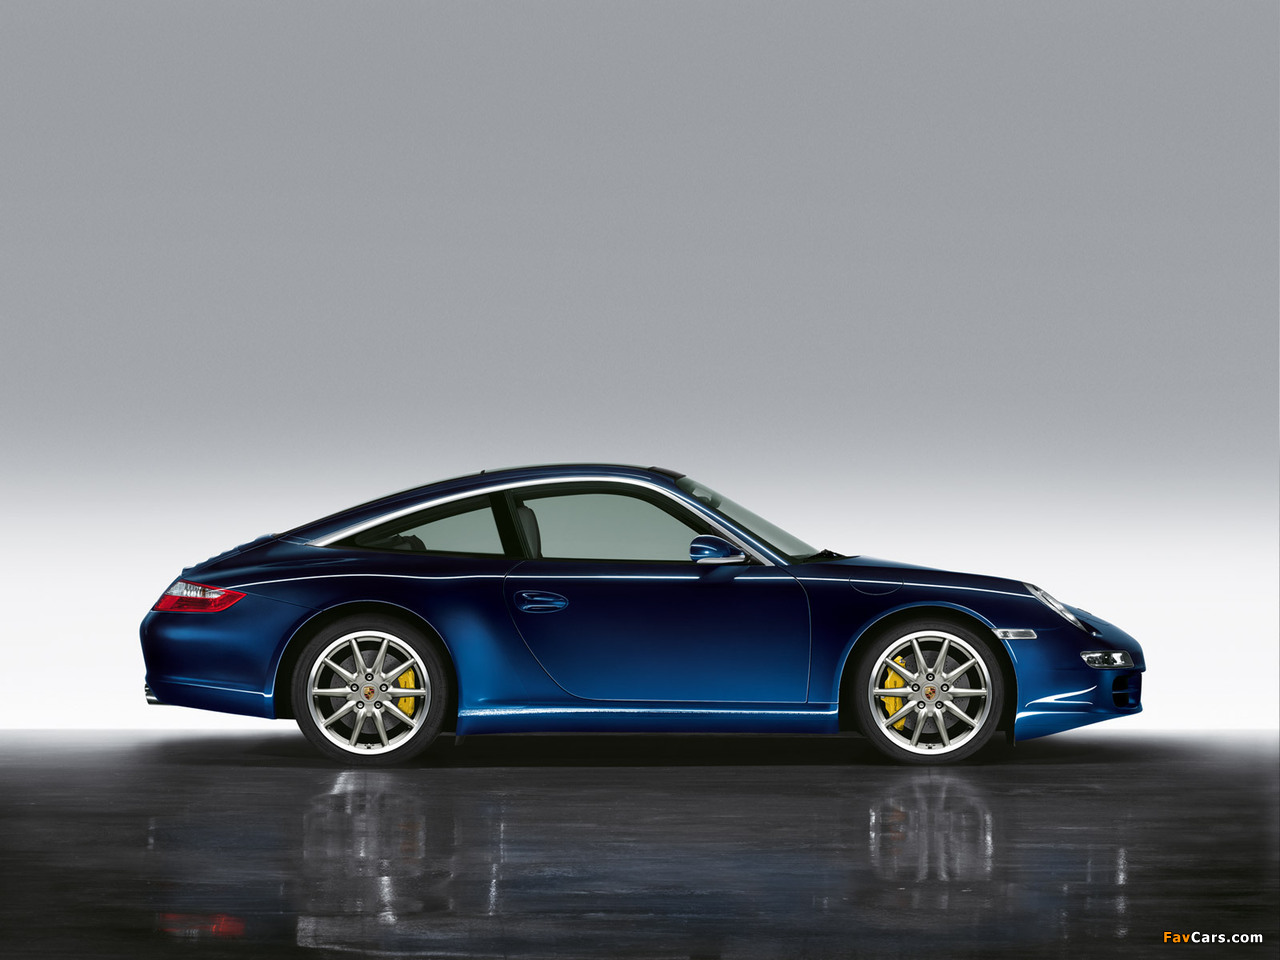 Porsche 911 Targa 4s 997 2005 08 Pictures 1280x960